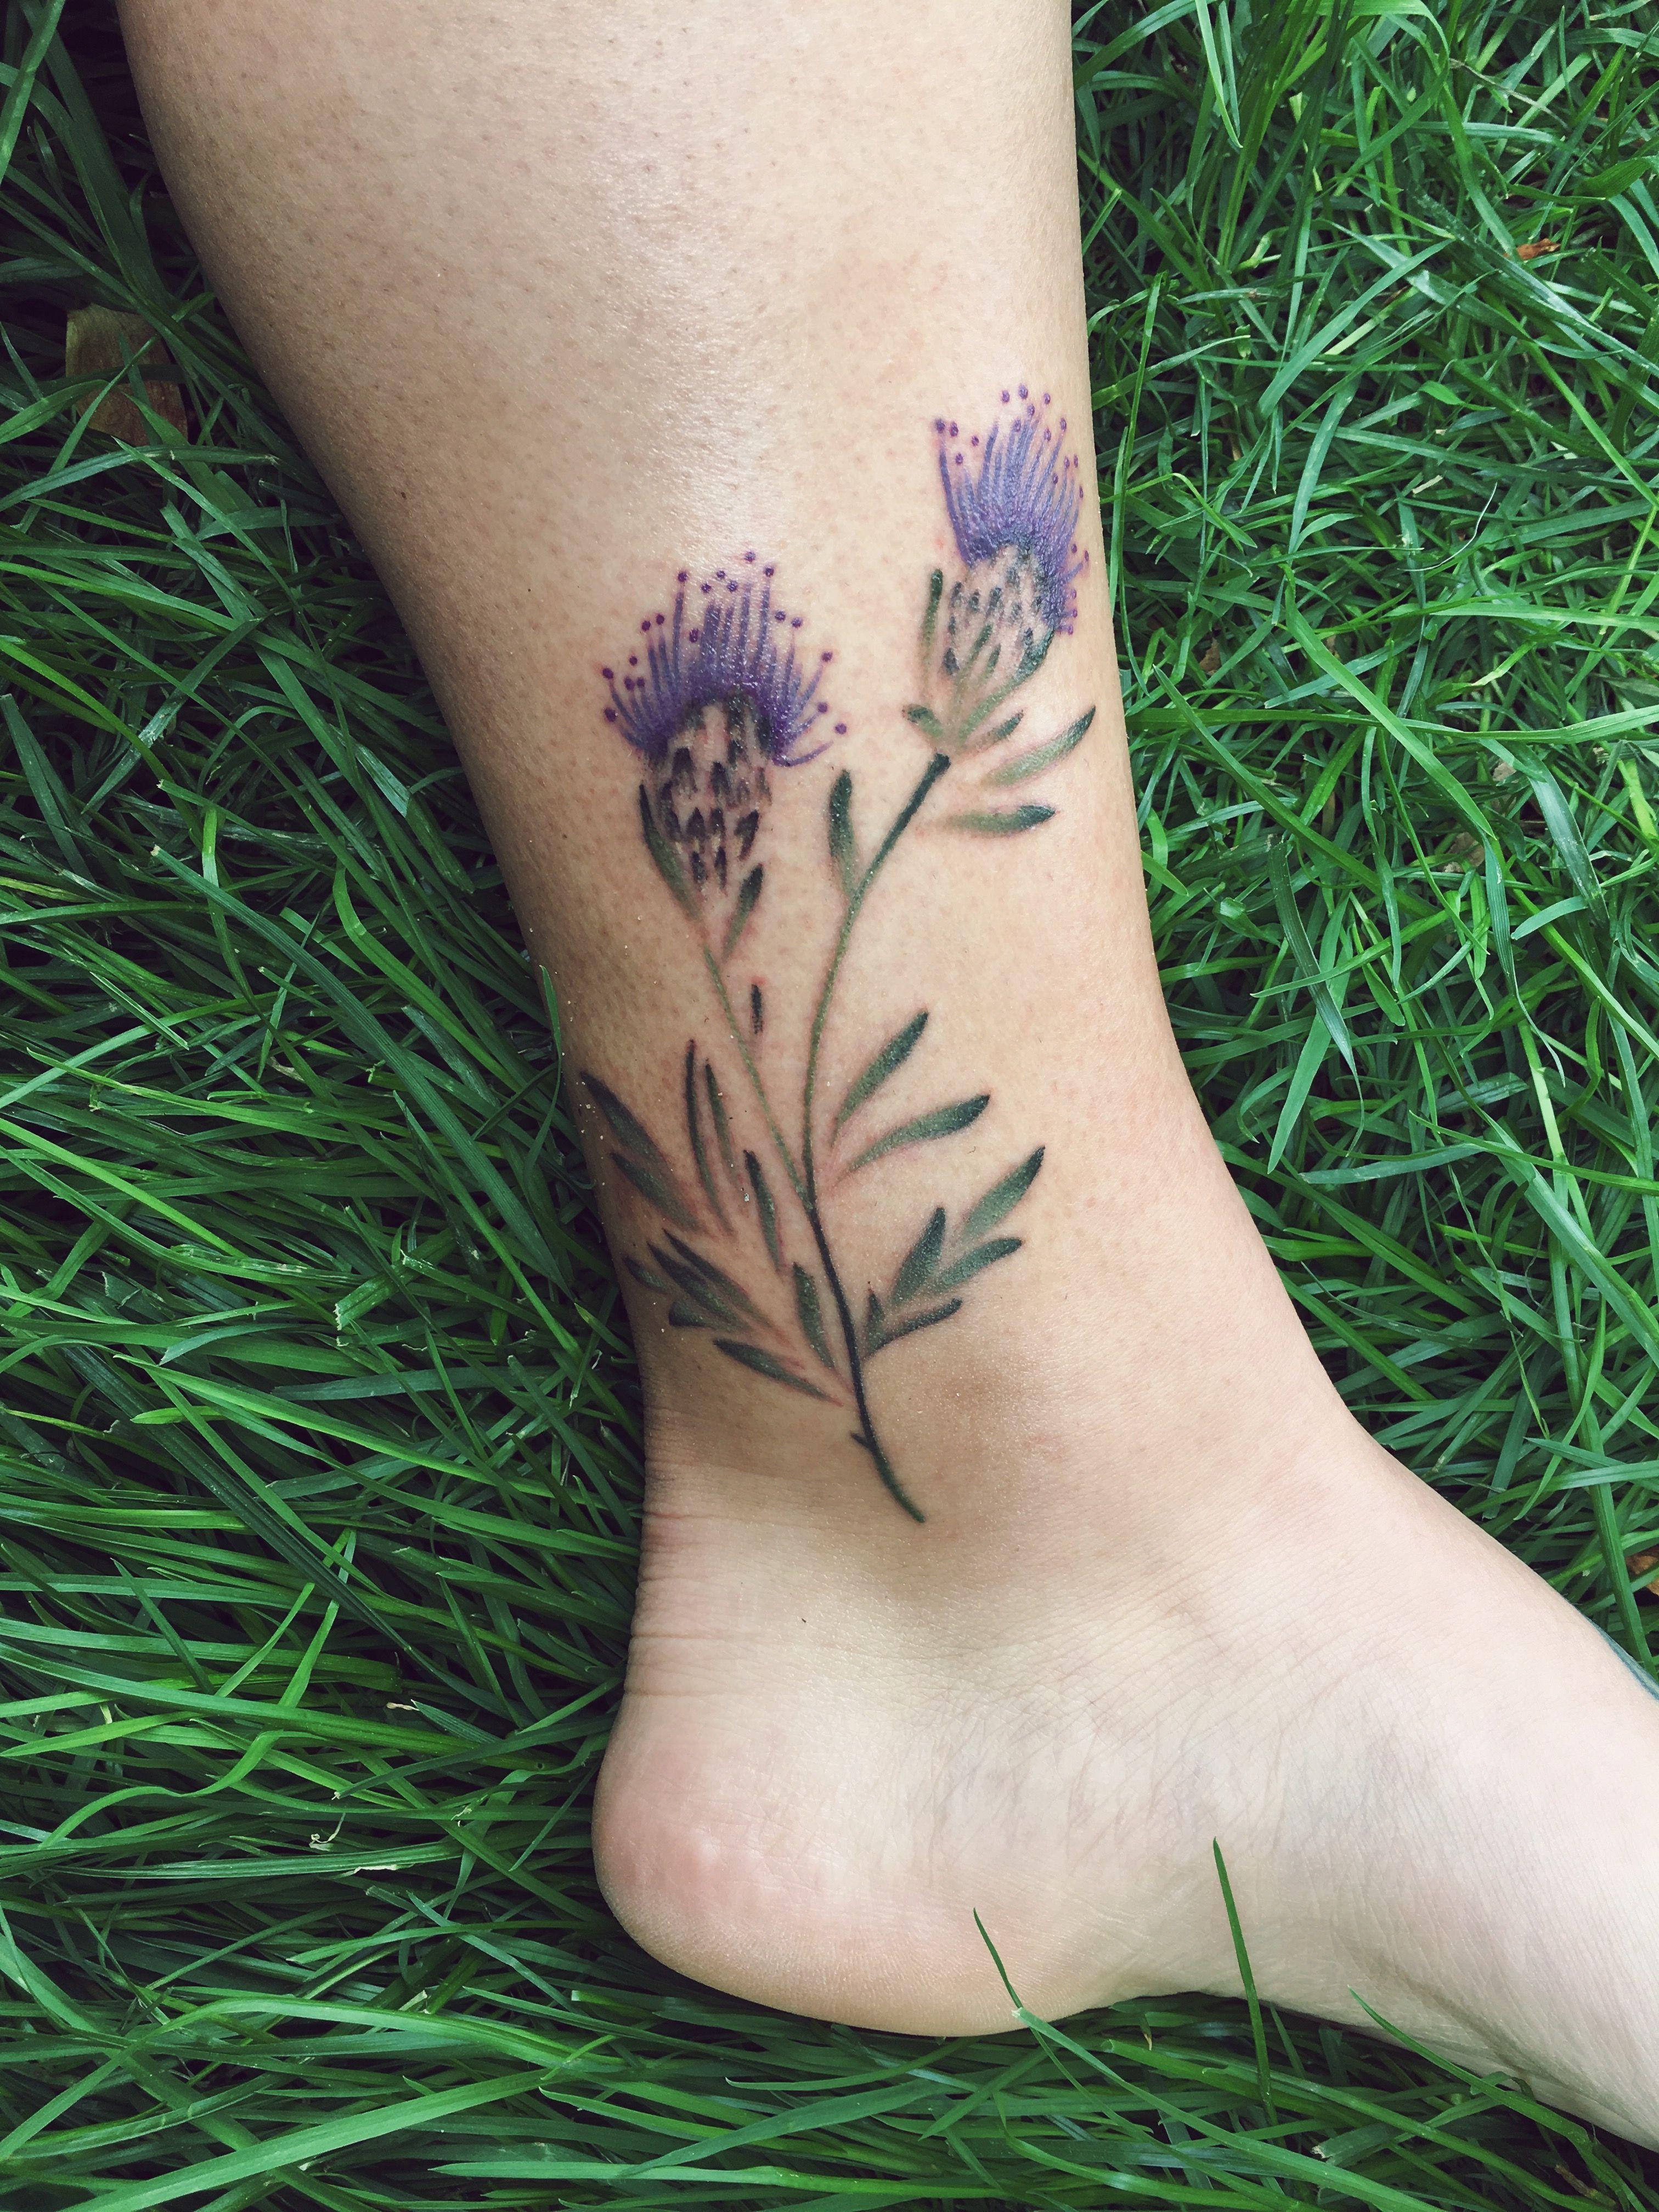 scottish thistles tattoos pinterest scottish thistle tattoo and thistle tattoo. Black Bedroom Furniture Sets. Home Design Ideas